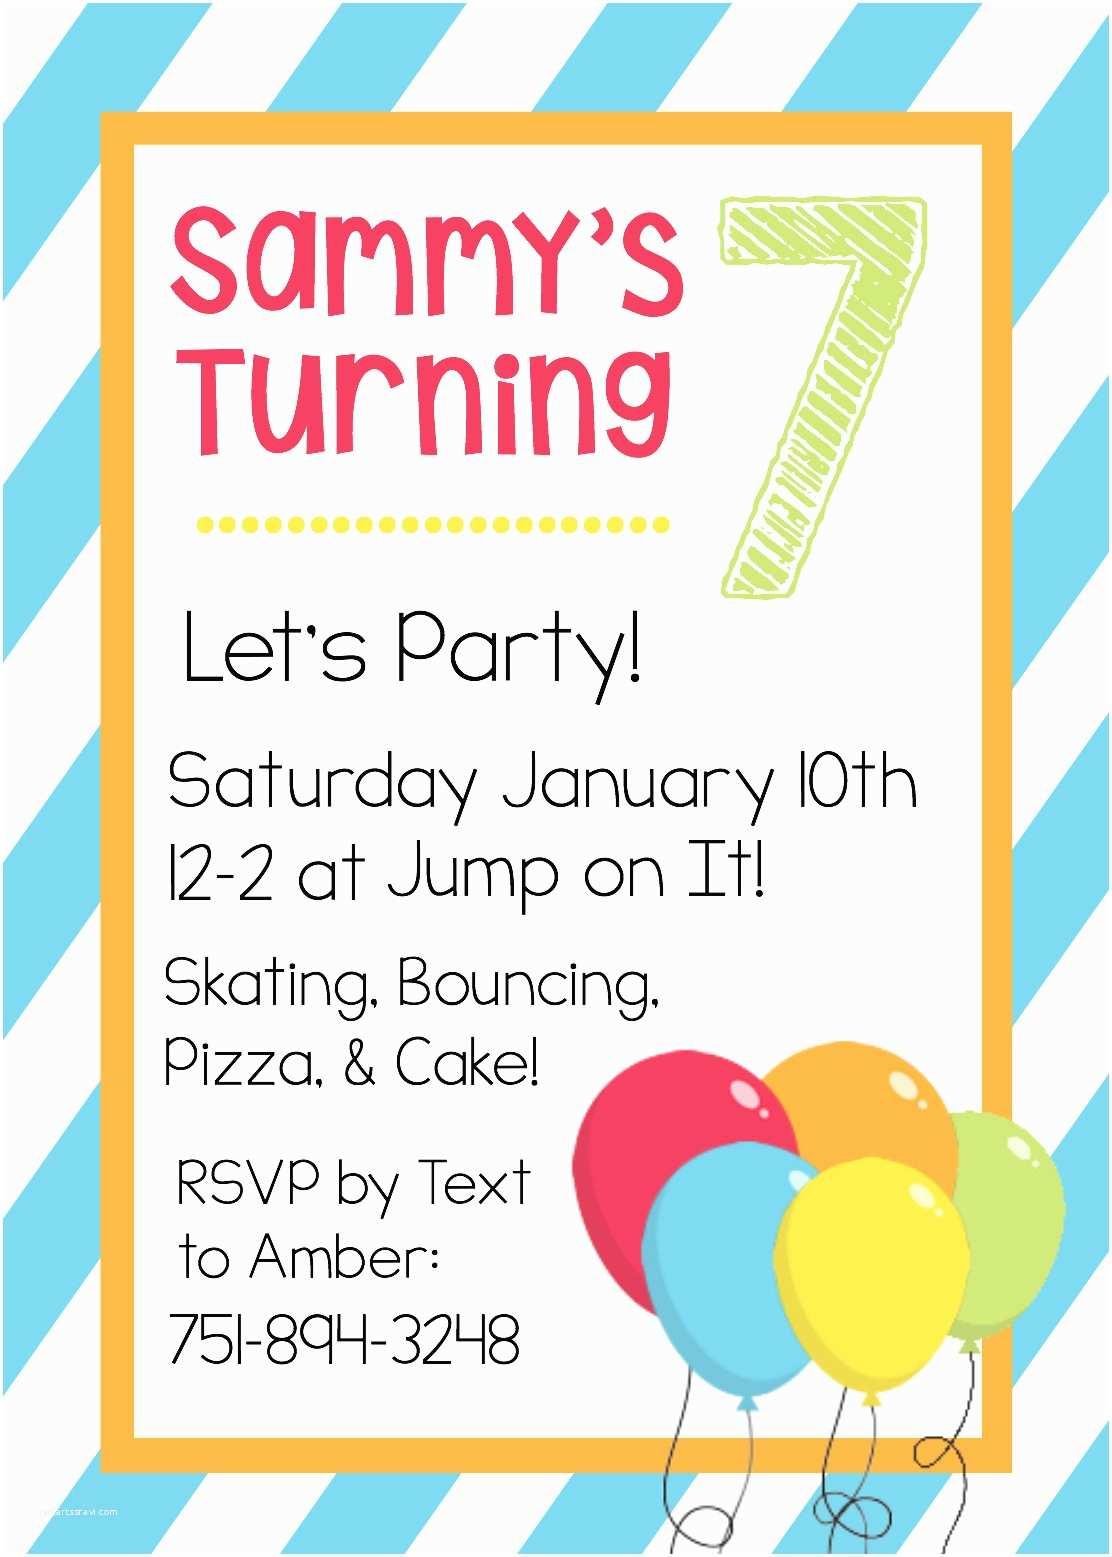 Free Party Invitations Free Printable Birthday Invitation Templates